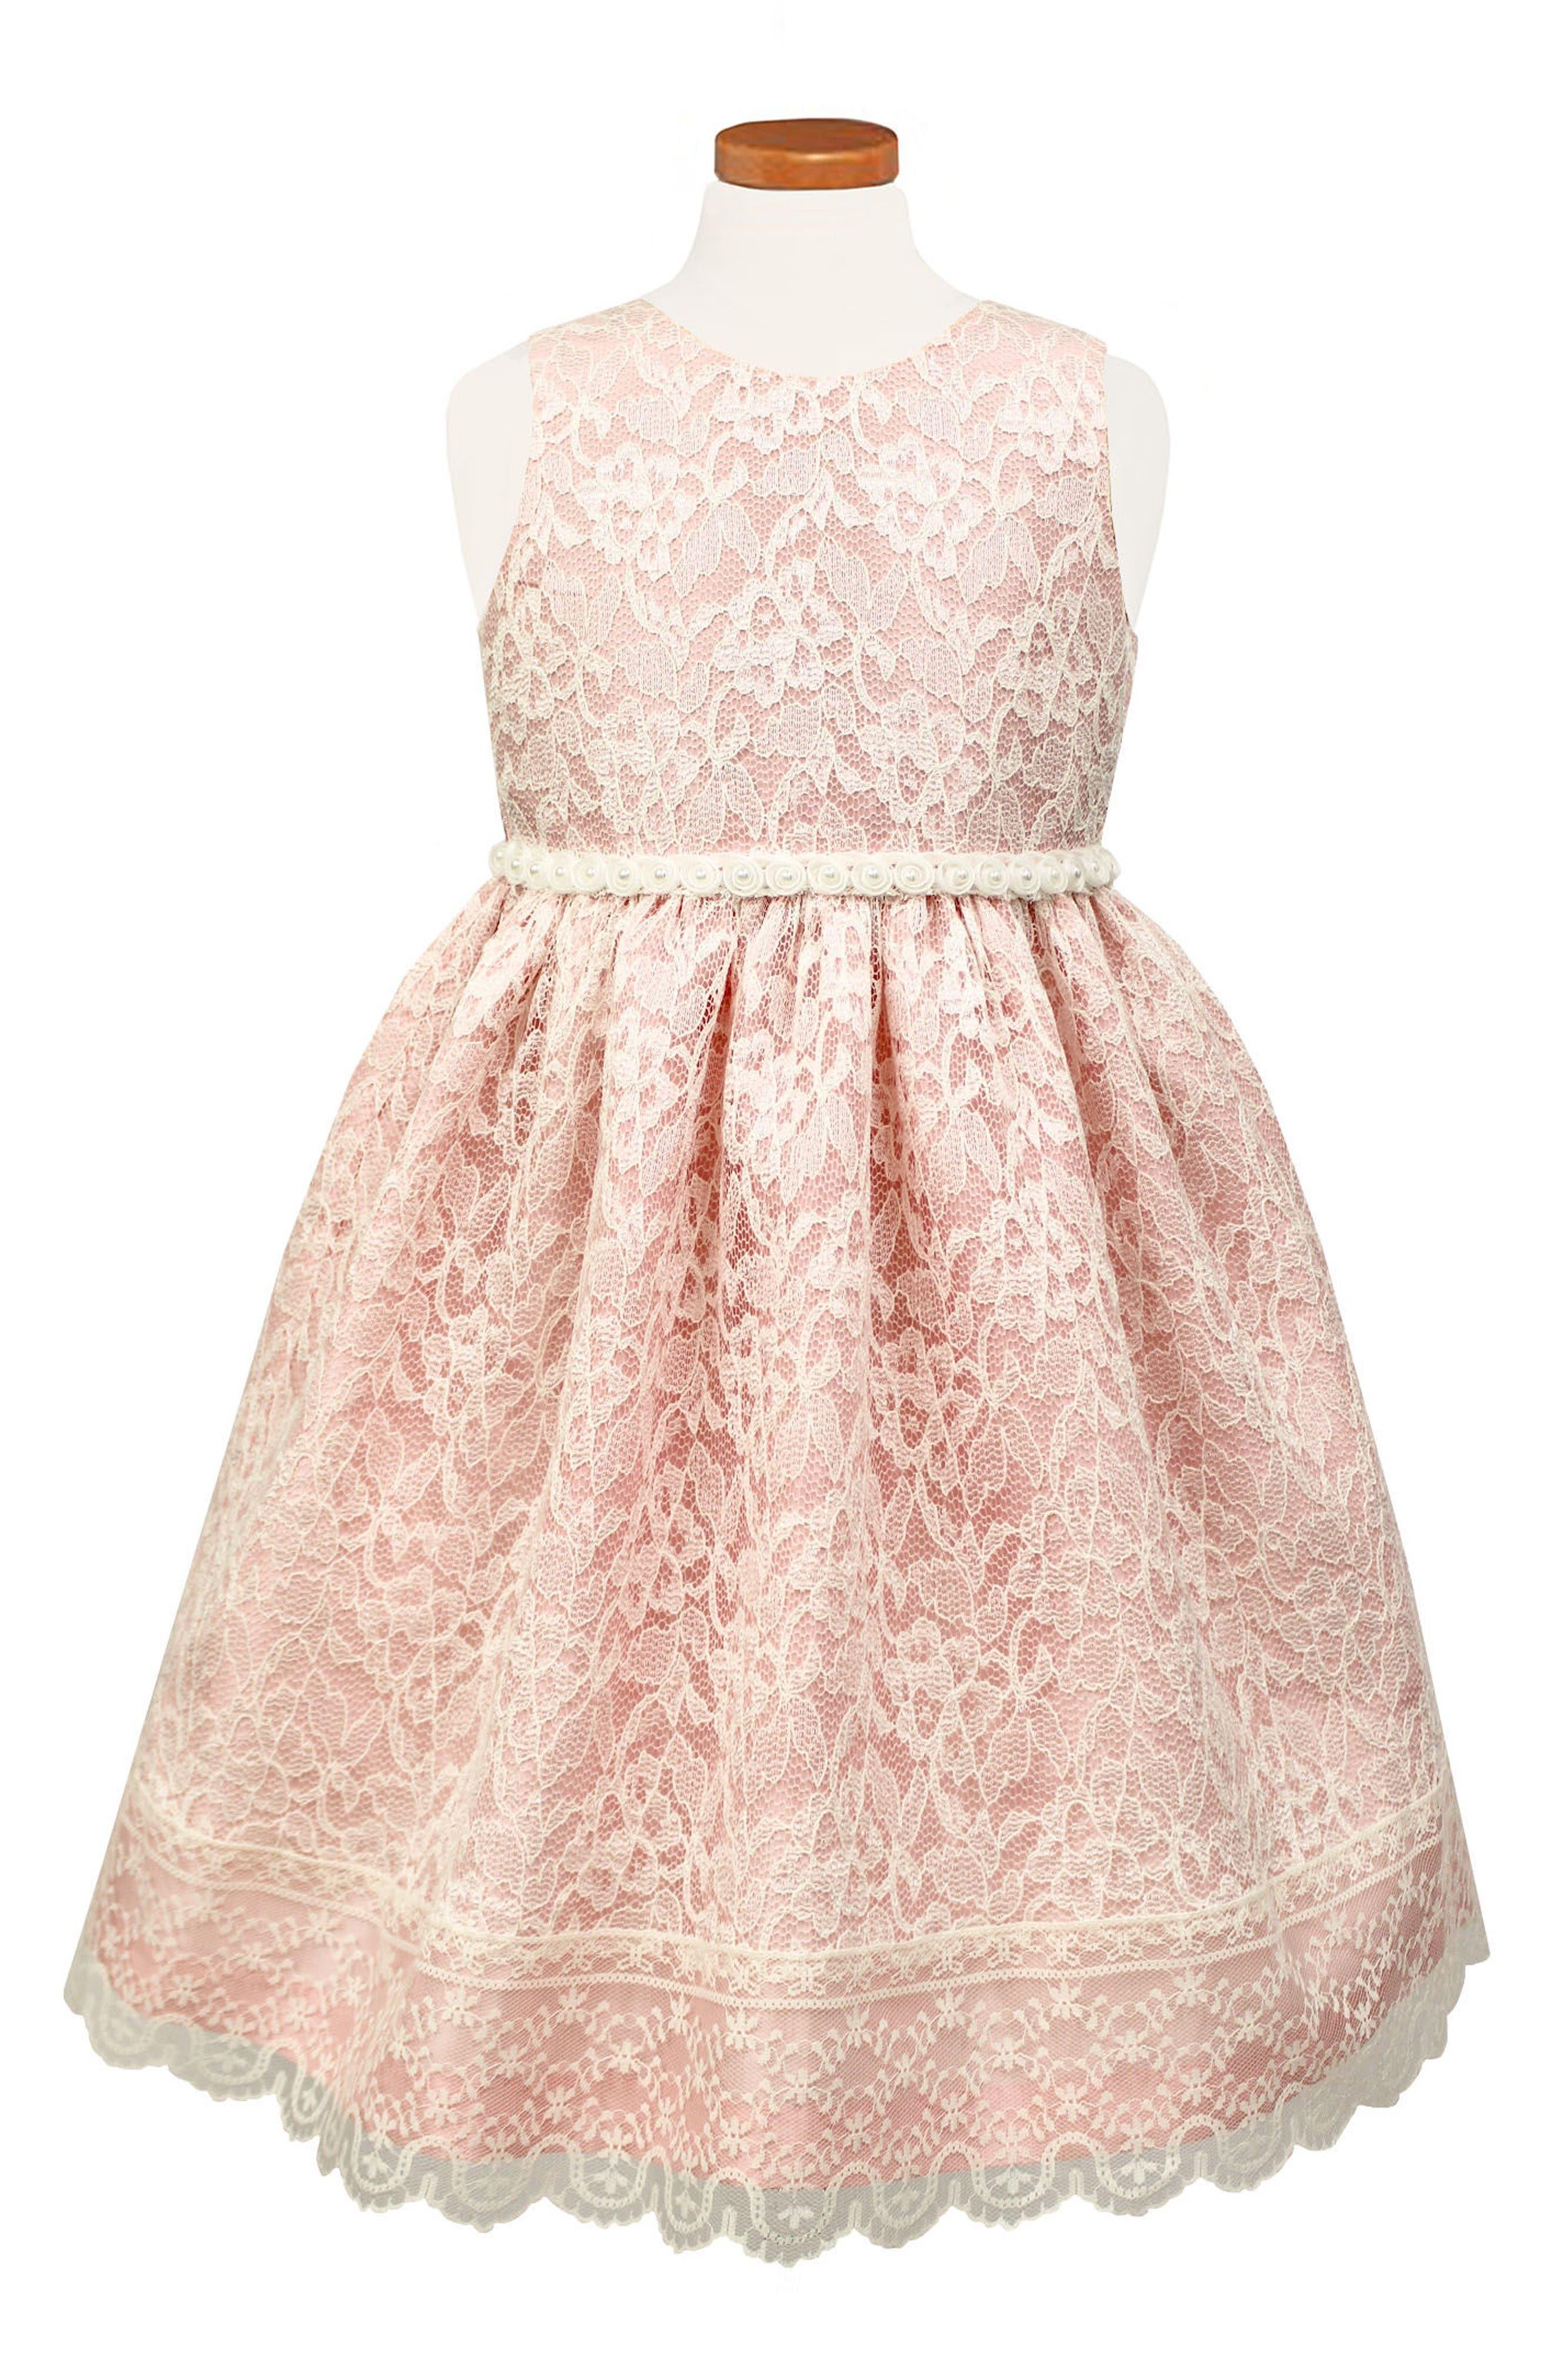 Sorbet Sleeveless Lace Dress (Big Girls)